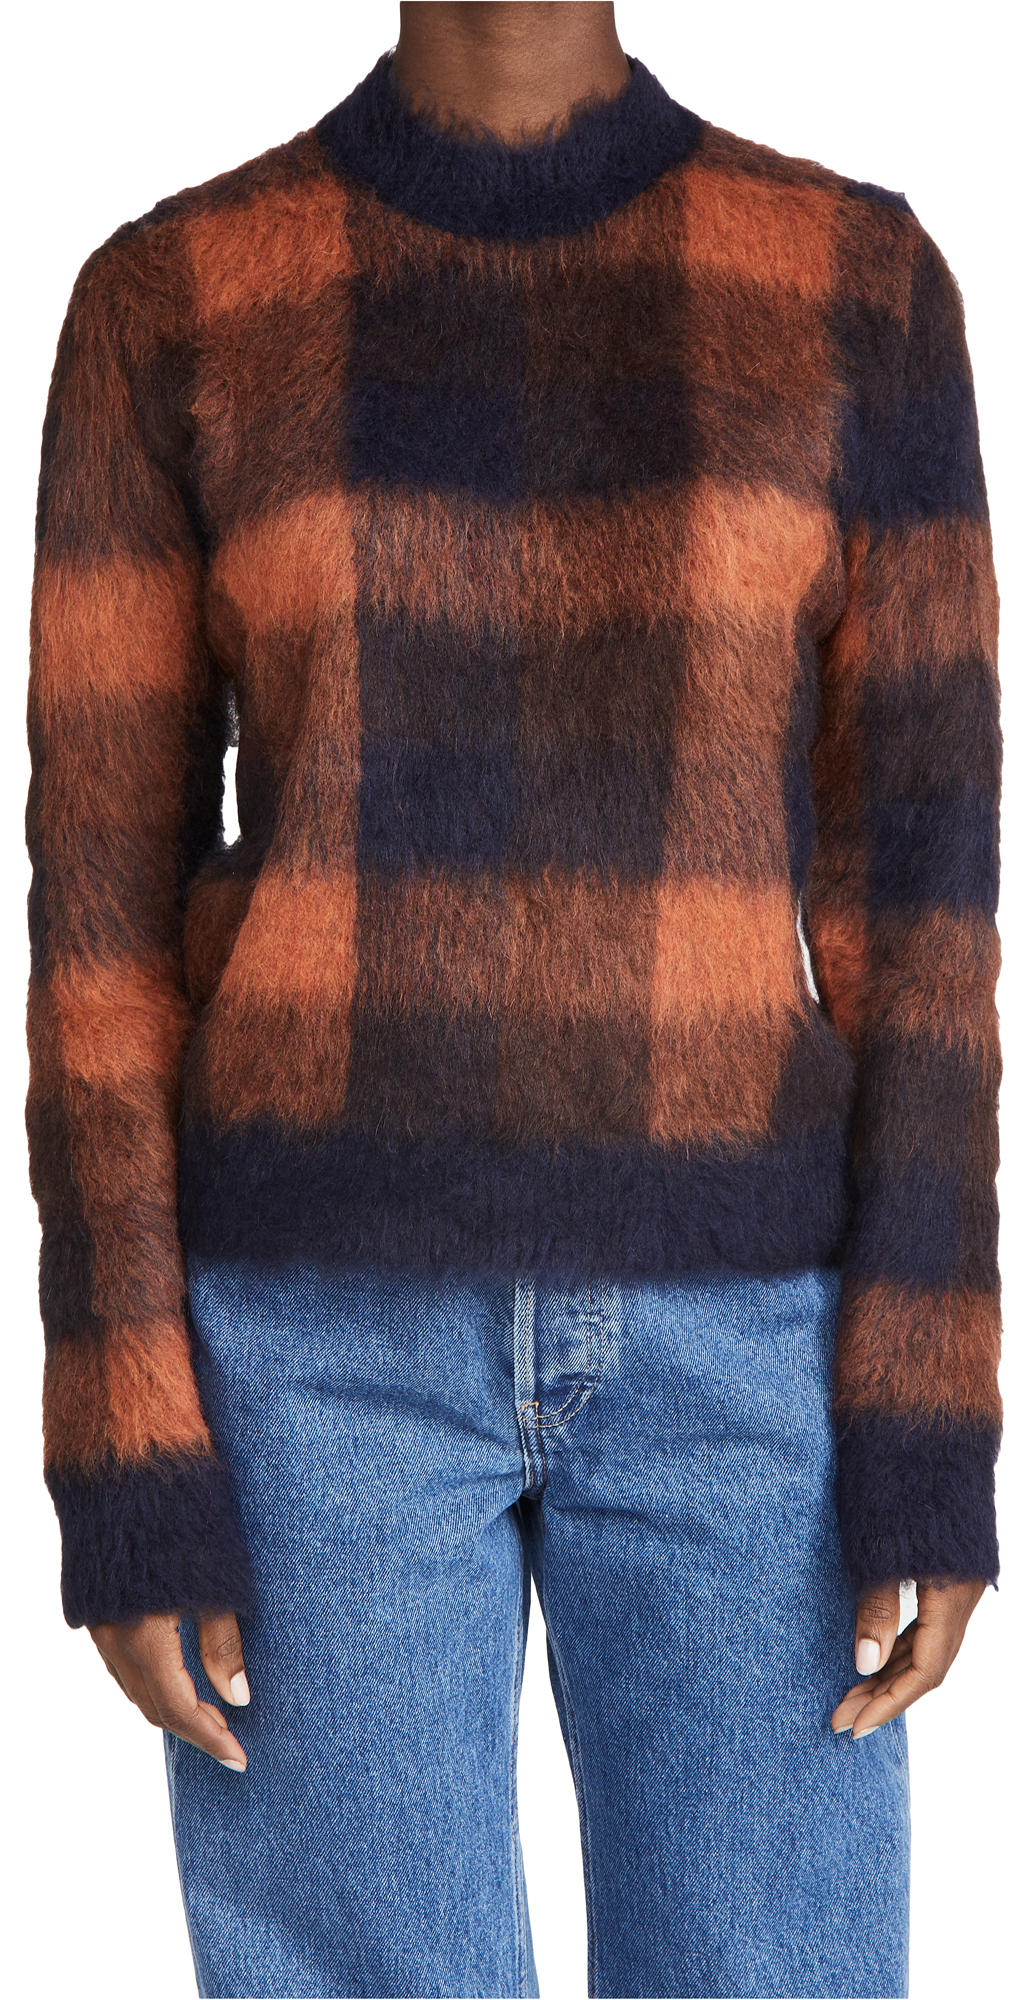 Acne Studios Kanya Check Sweater